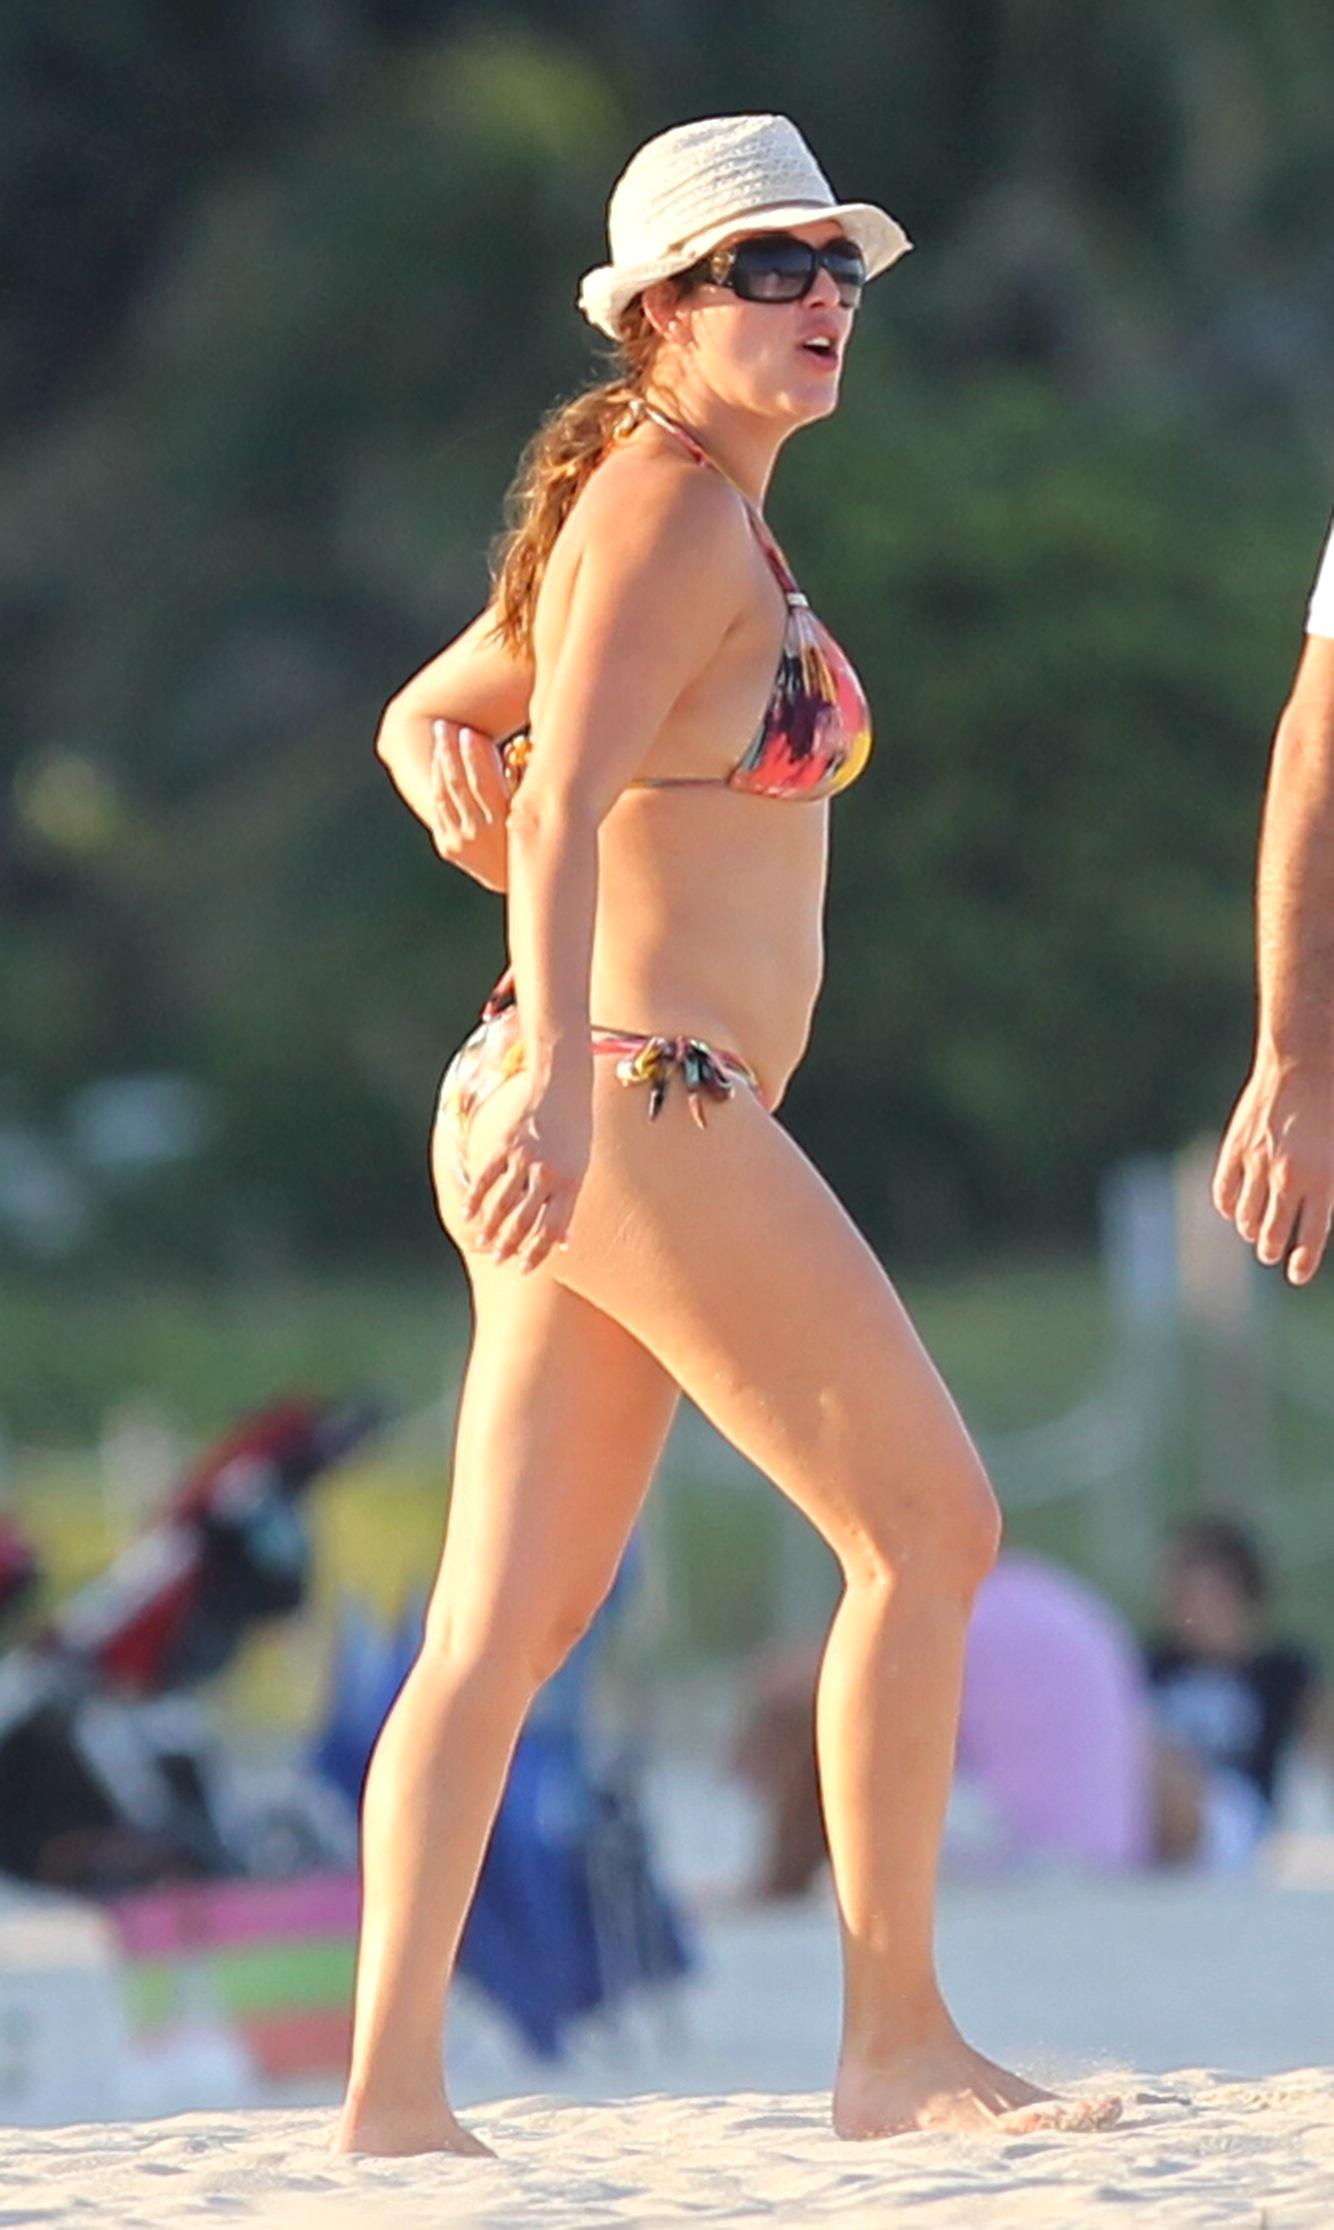 Alice machado bikini